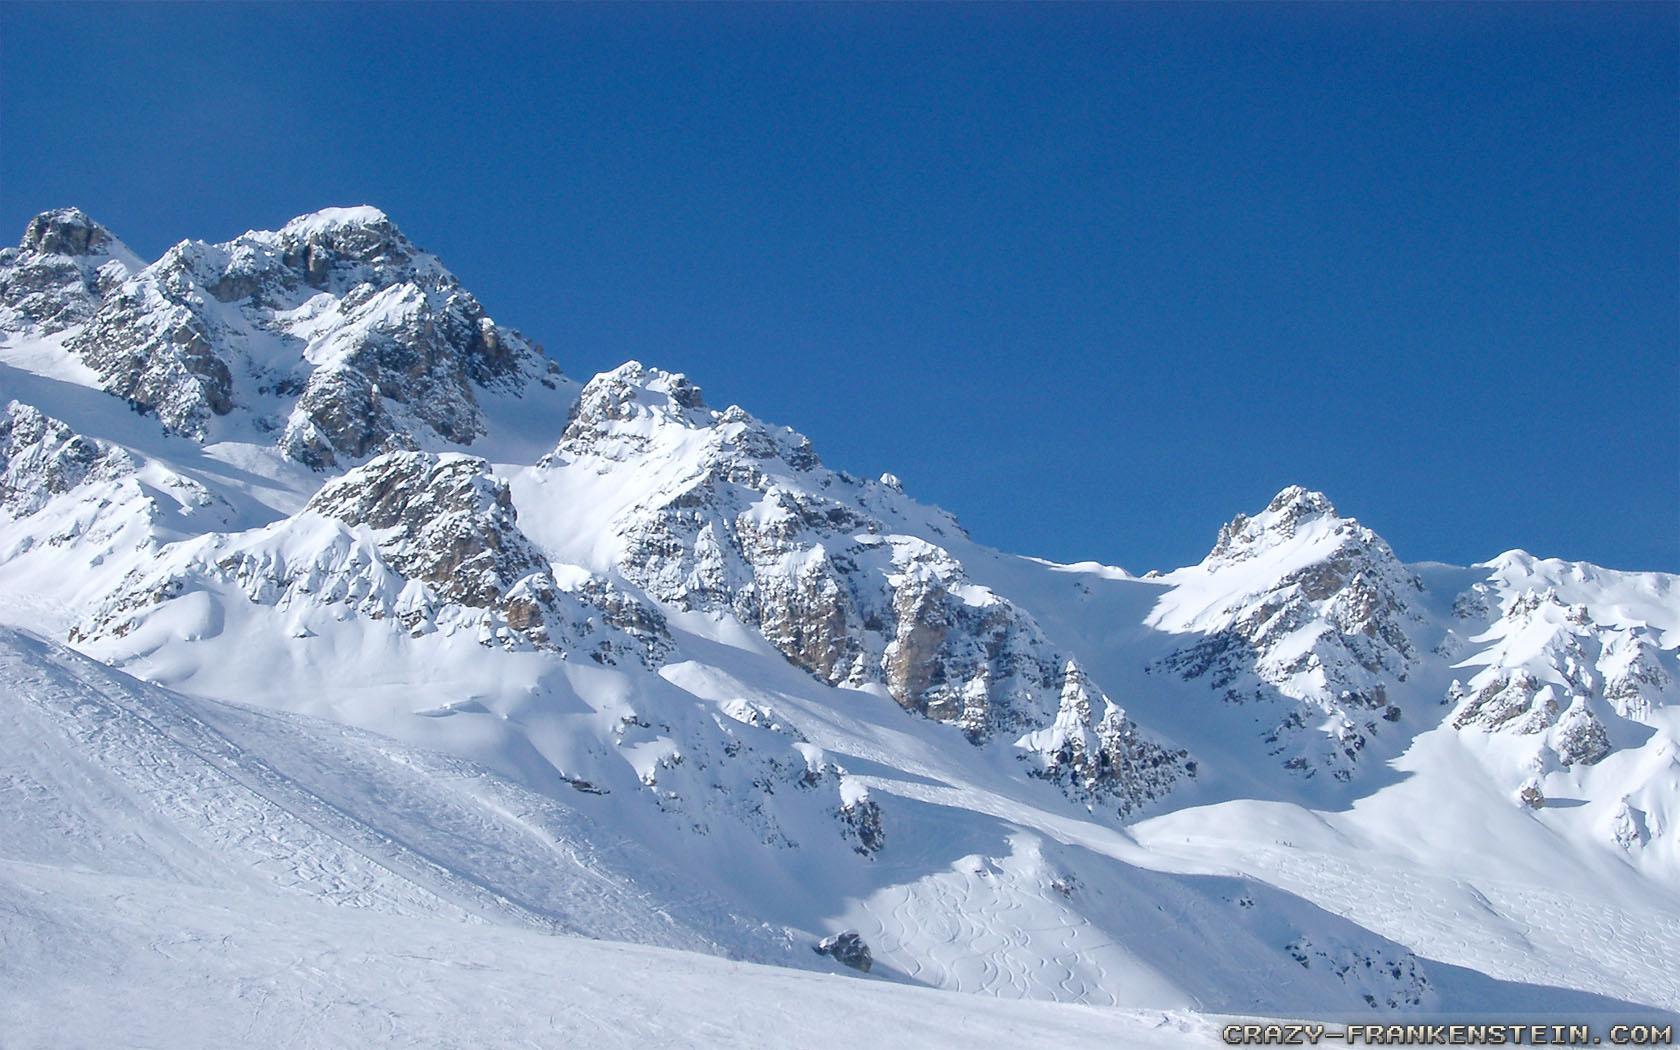 Mountains Winter Snow Wallpapers 1680x1050 pixel Nature HD Wallpaper 1680x1050